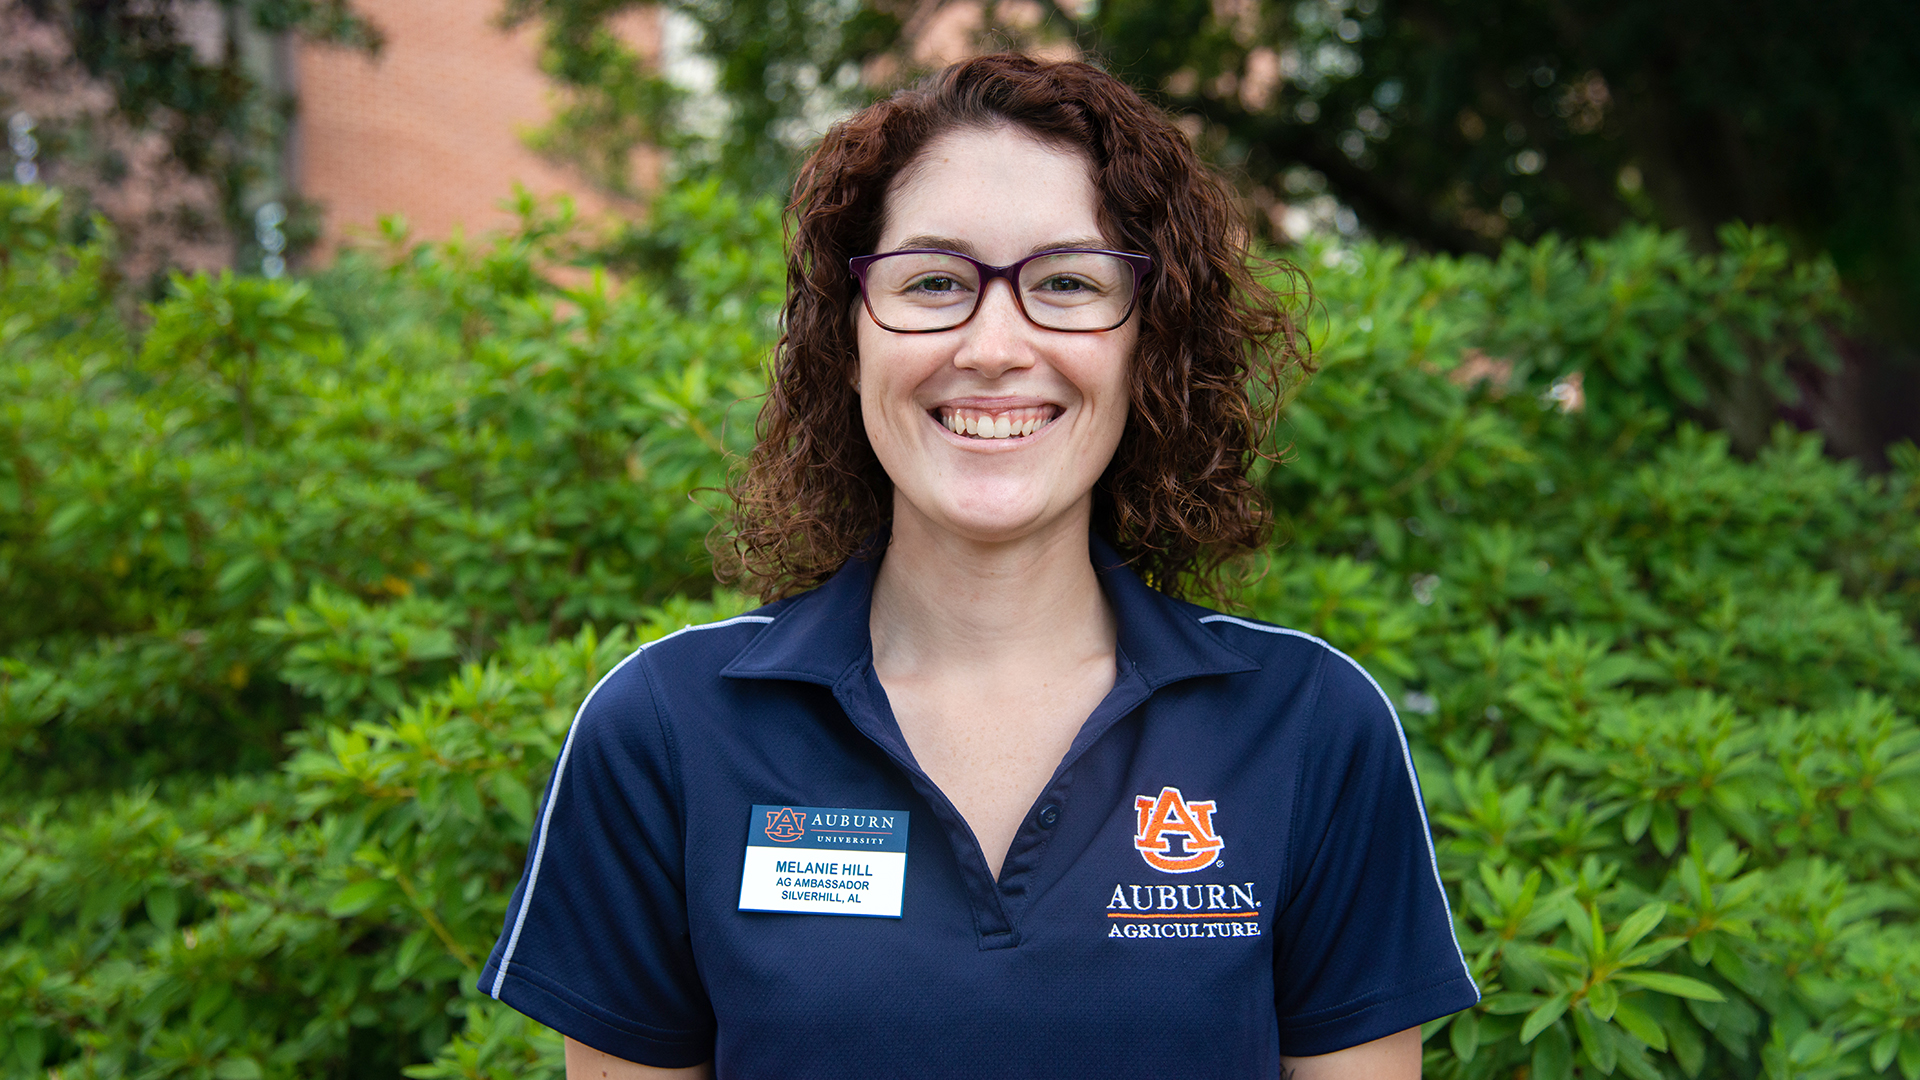 Melanie Hill, Auburn Ag Ambassadors, AL Student, 2021